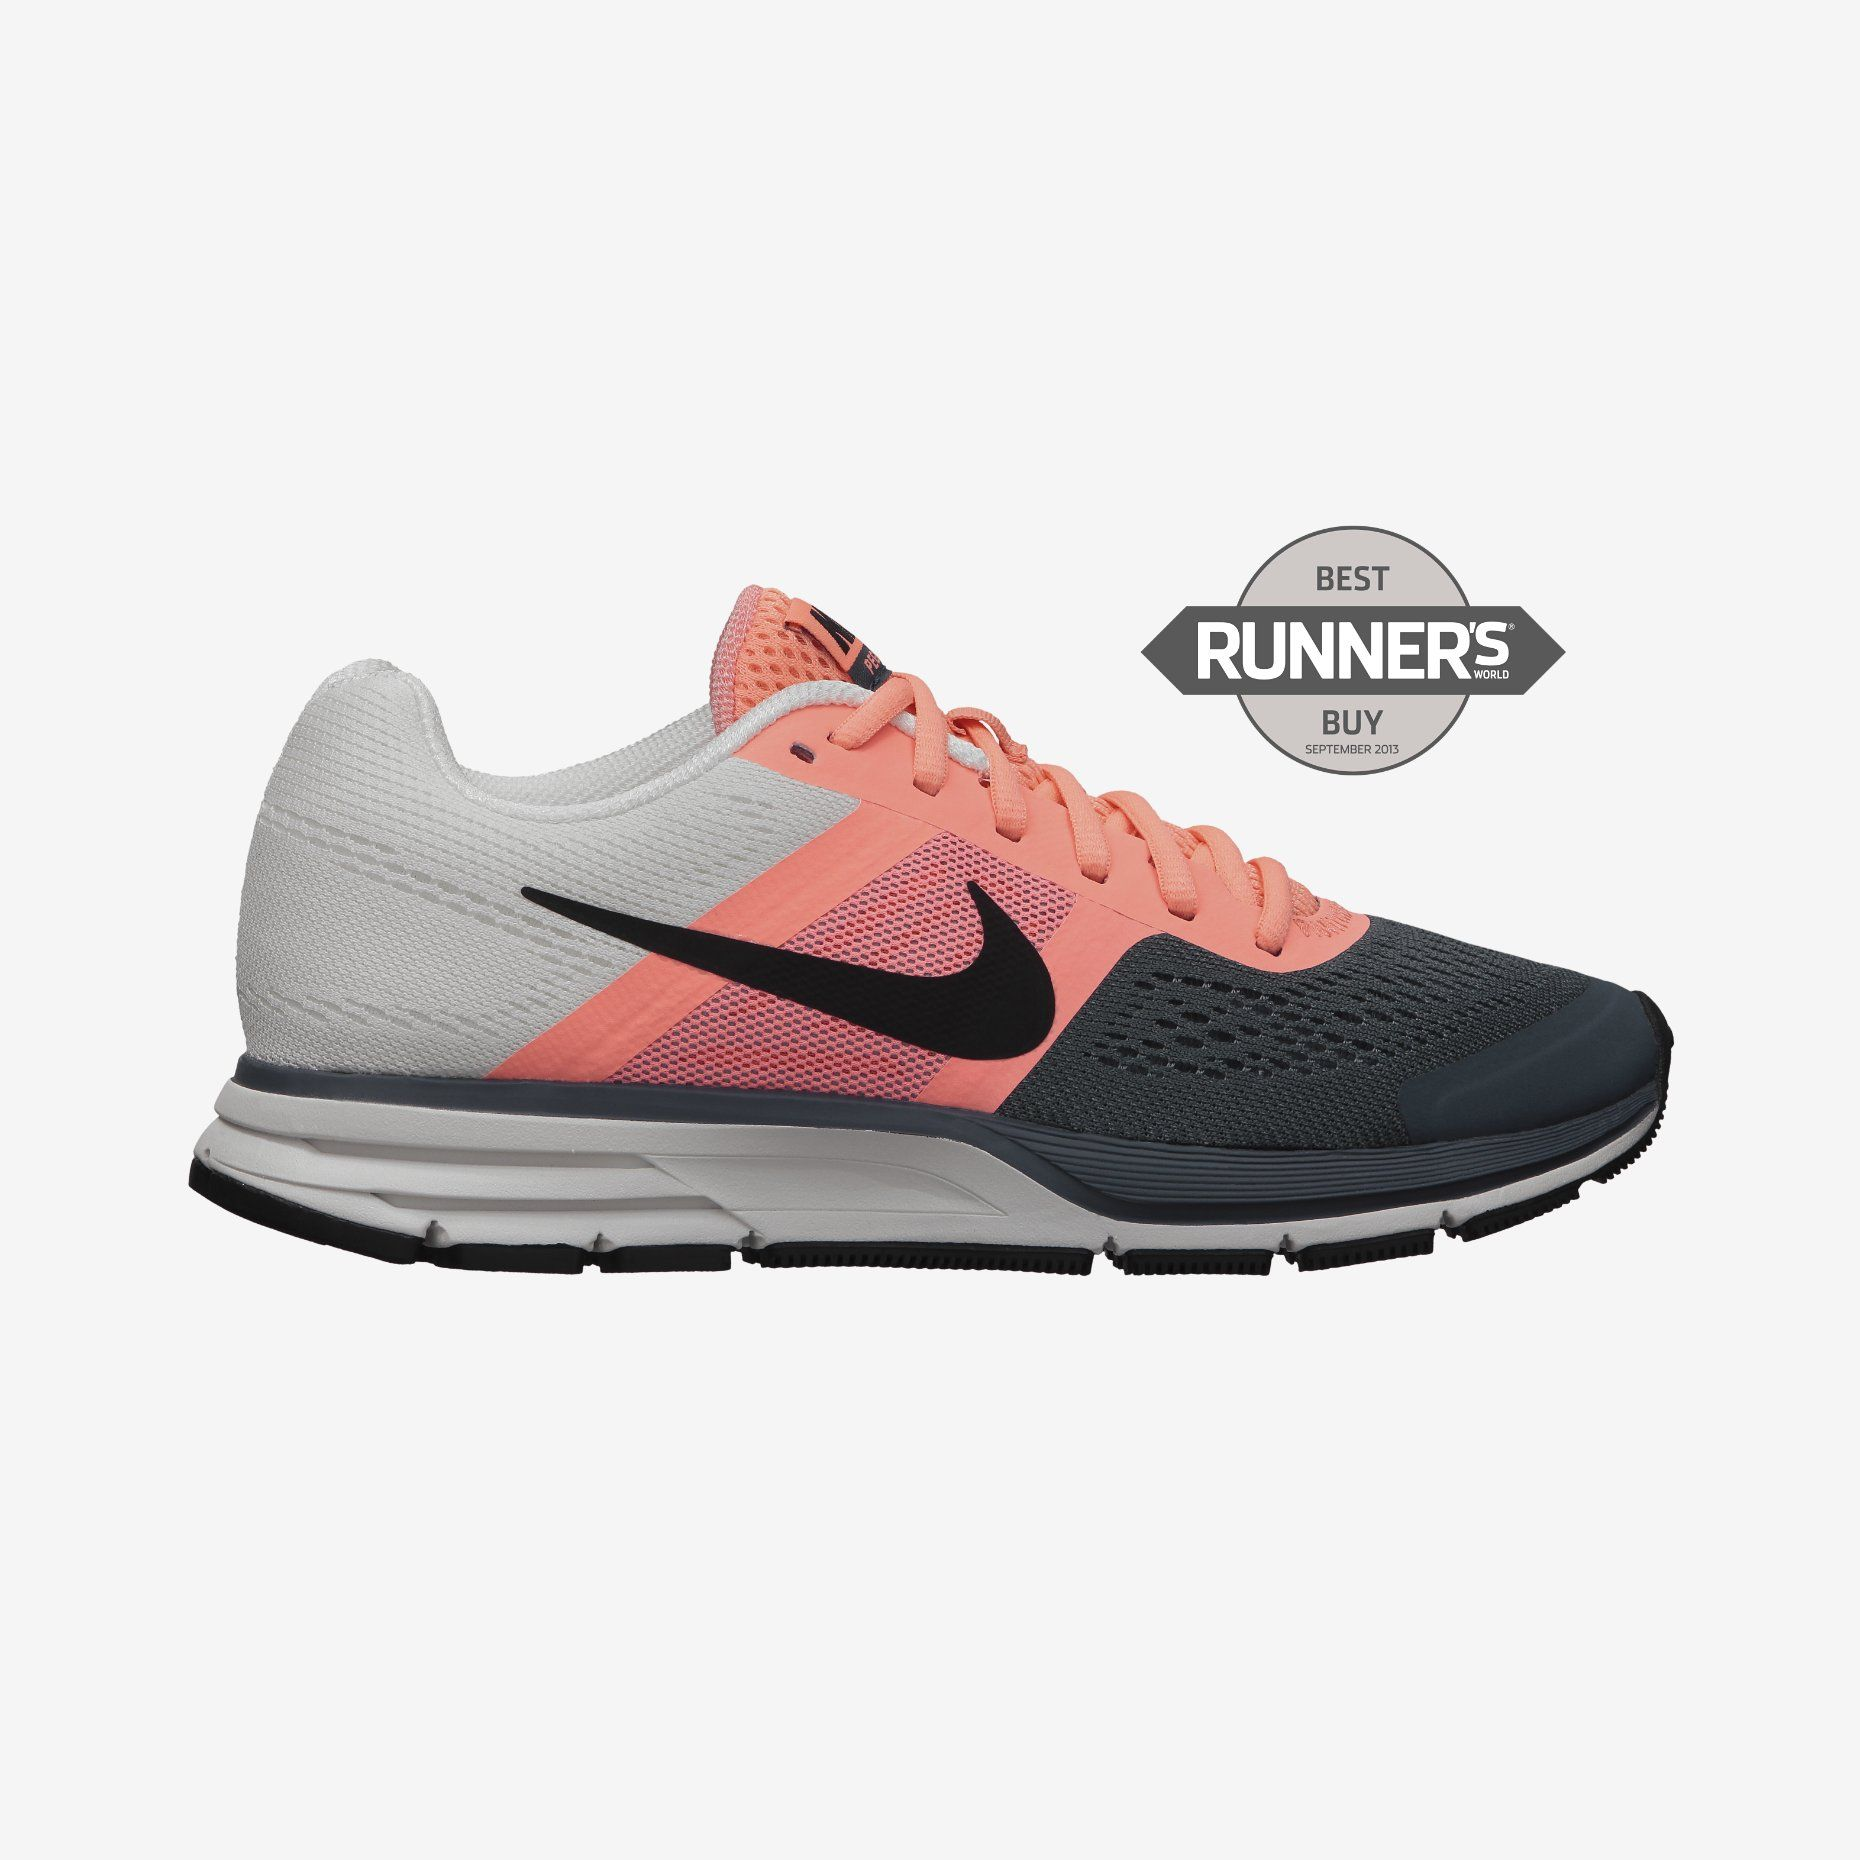 tarta Fábula suficiente  Nike Store. Nike Air Pegasus 30 Women's Running Shoe | Nike air pegasus,  Womens running shoes, Nike shox turbo